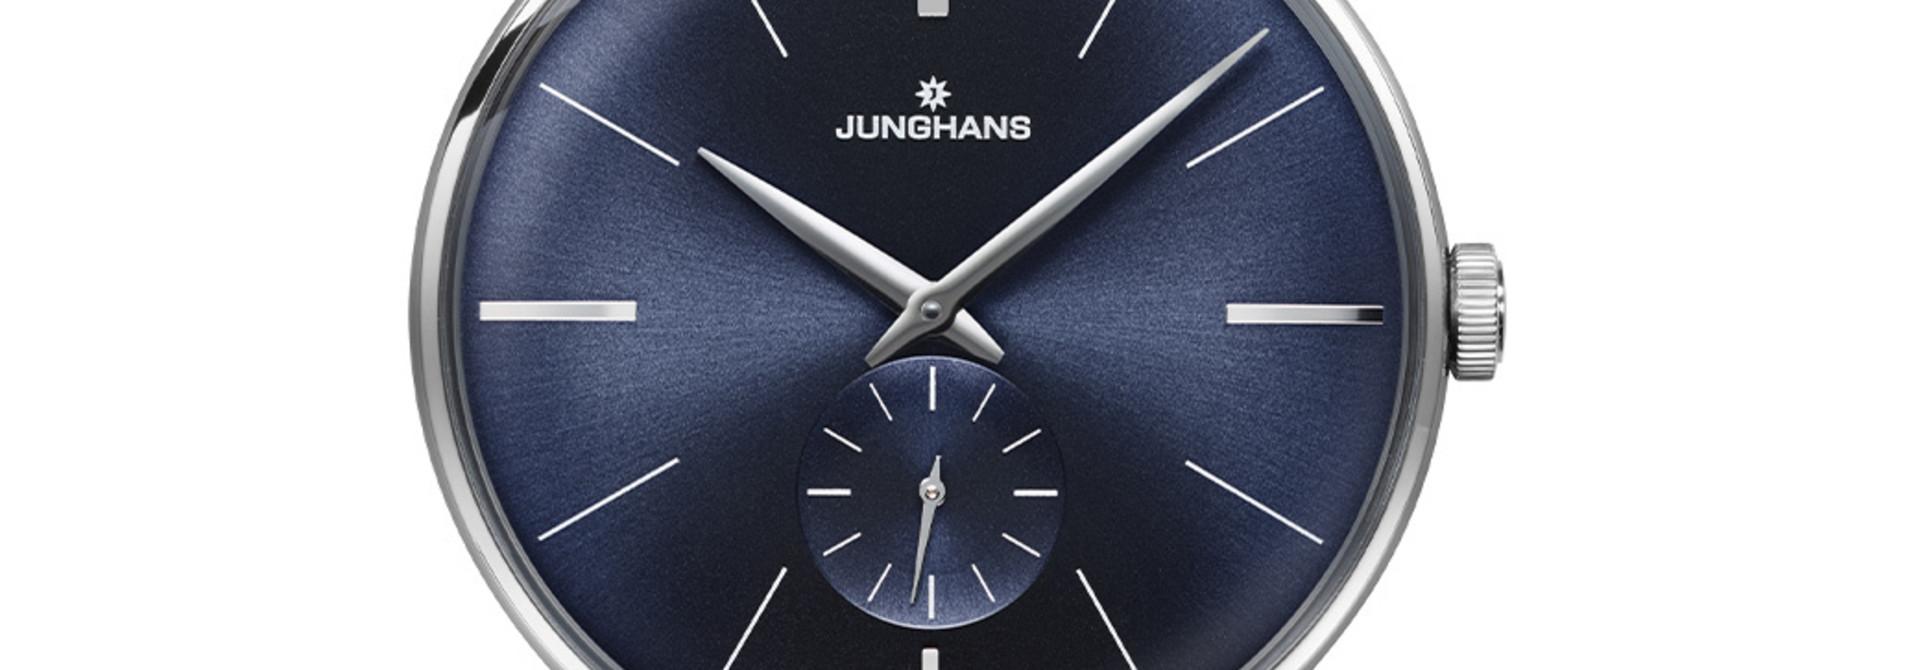 Junghans Meister Handwinder 027/3504.00